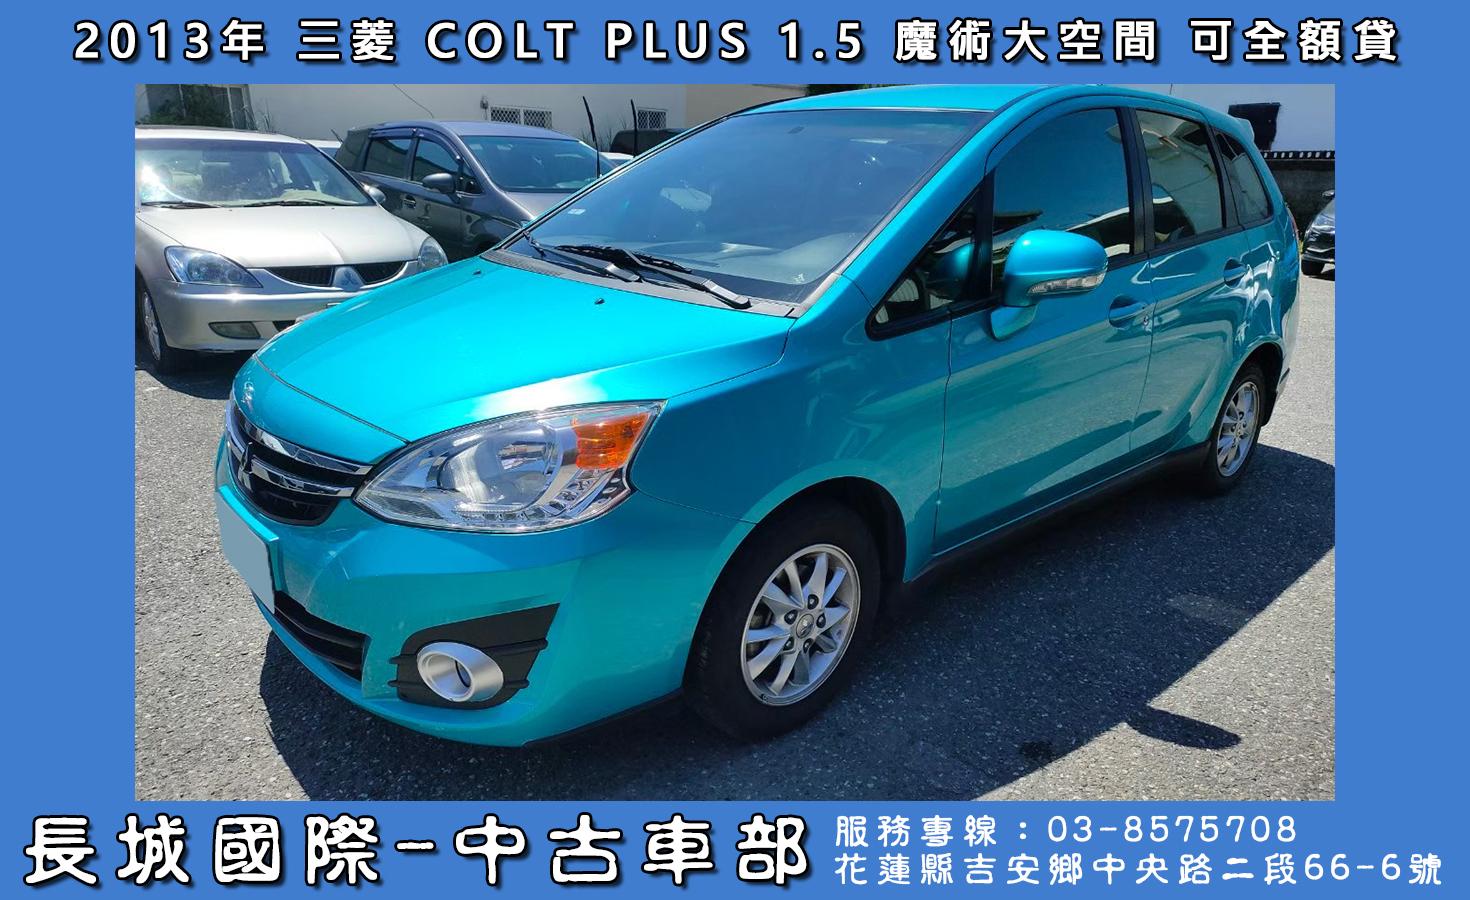 2016 Mitsubishi 三菱 Colt plus